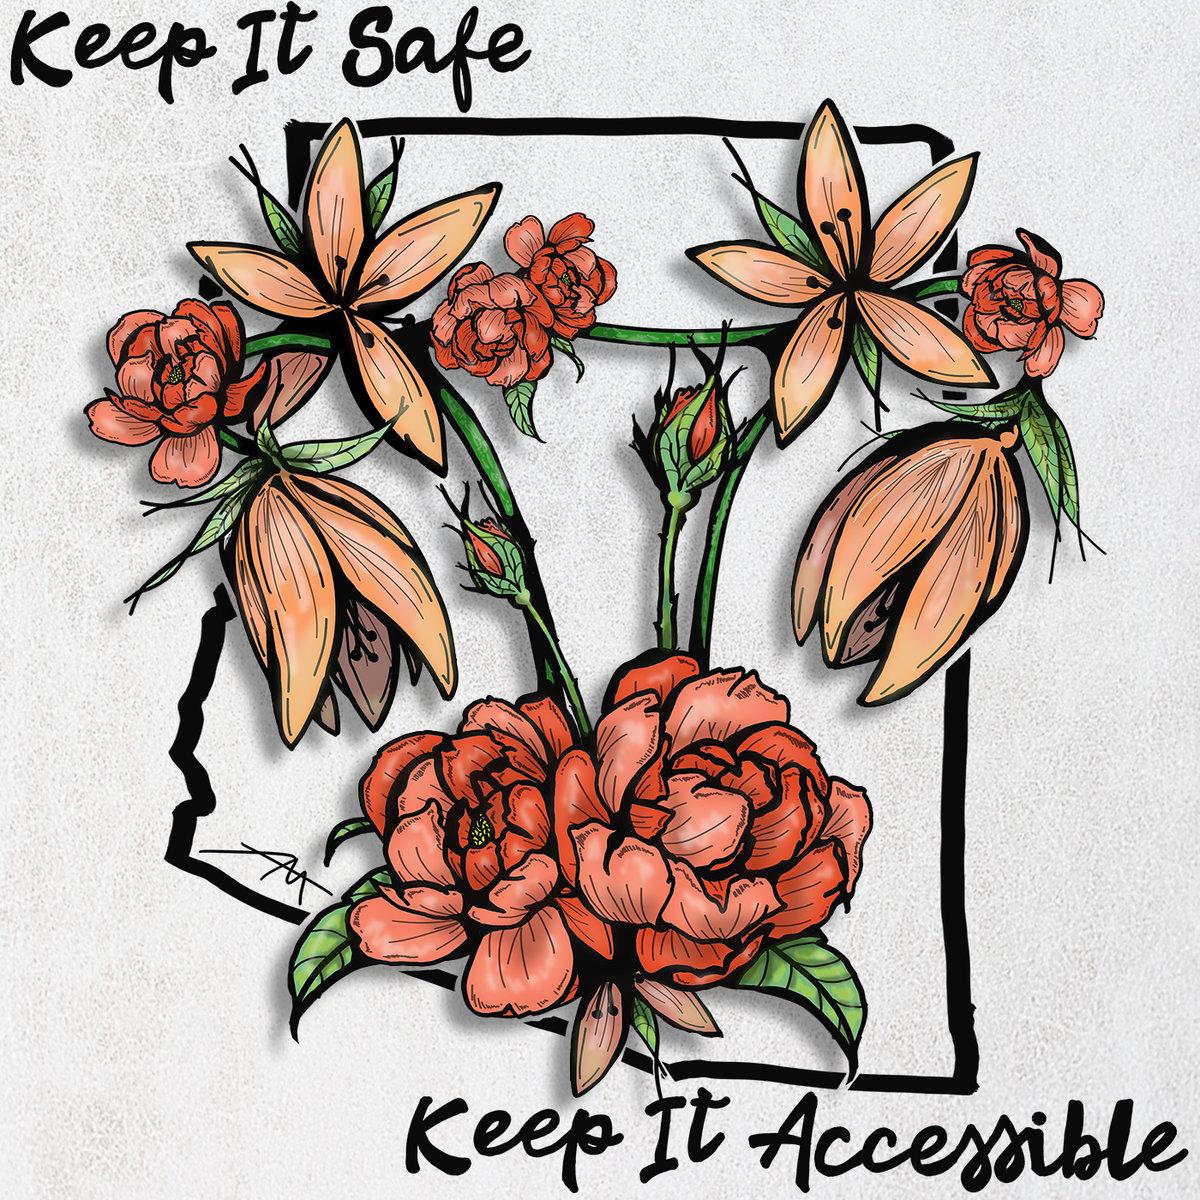 Keep It Safe 01